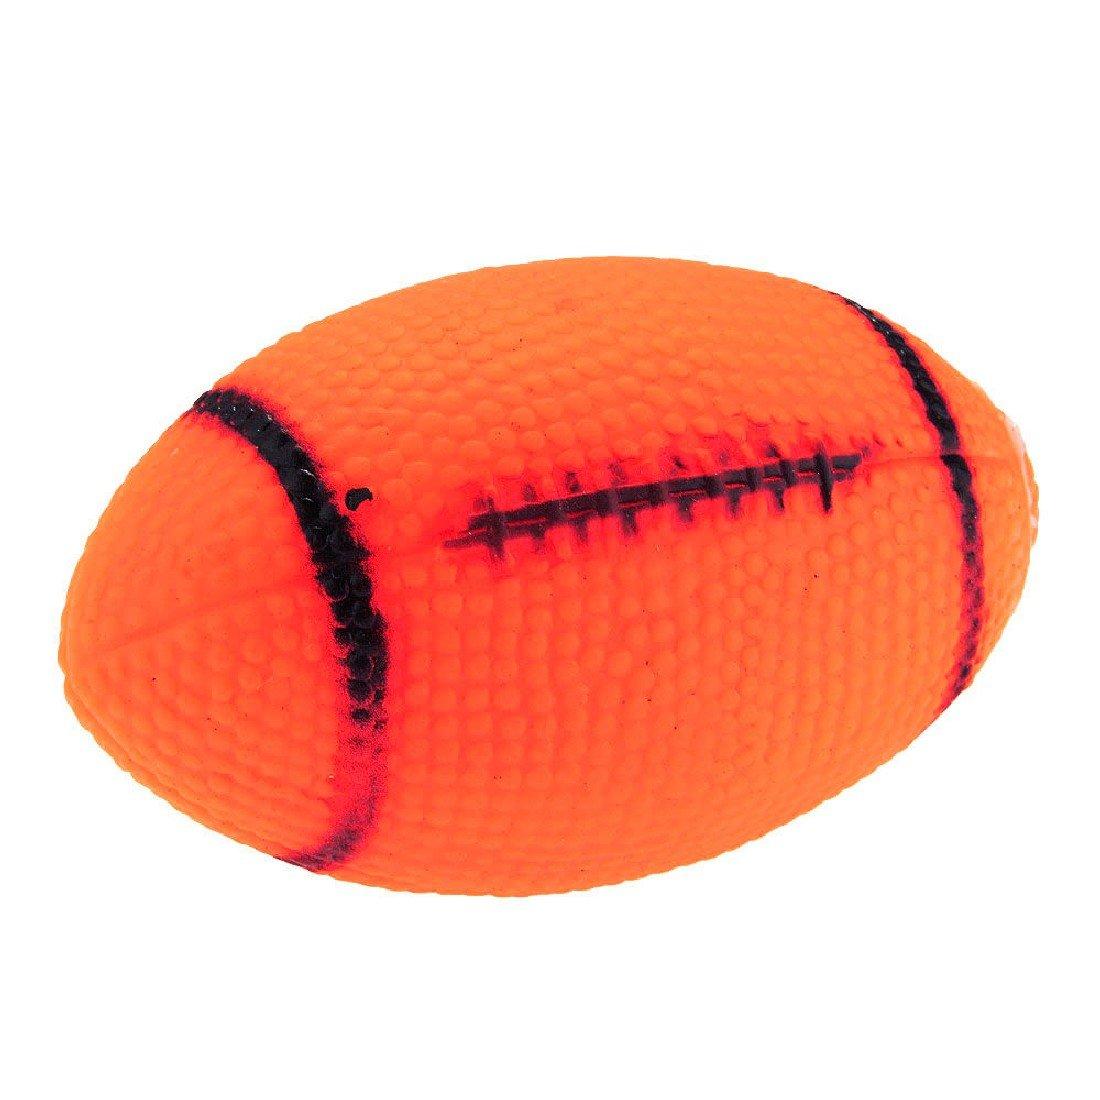 Mascota Perro Cachorro Squeak Chew Jugar Juguete de balón de Rugby ...